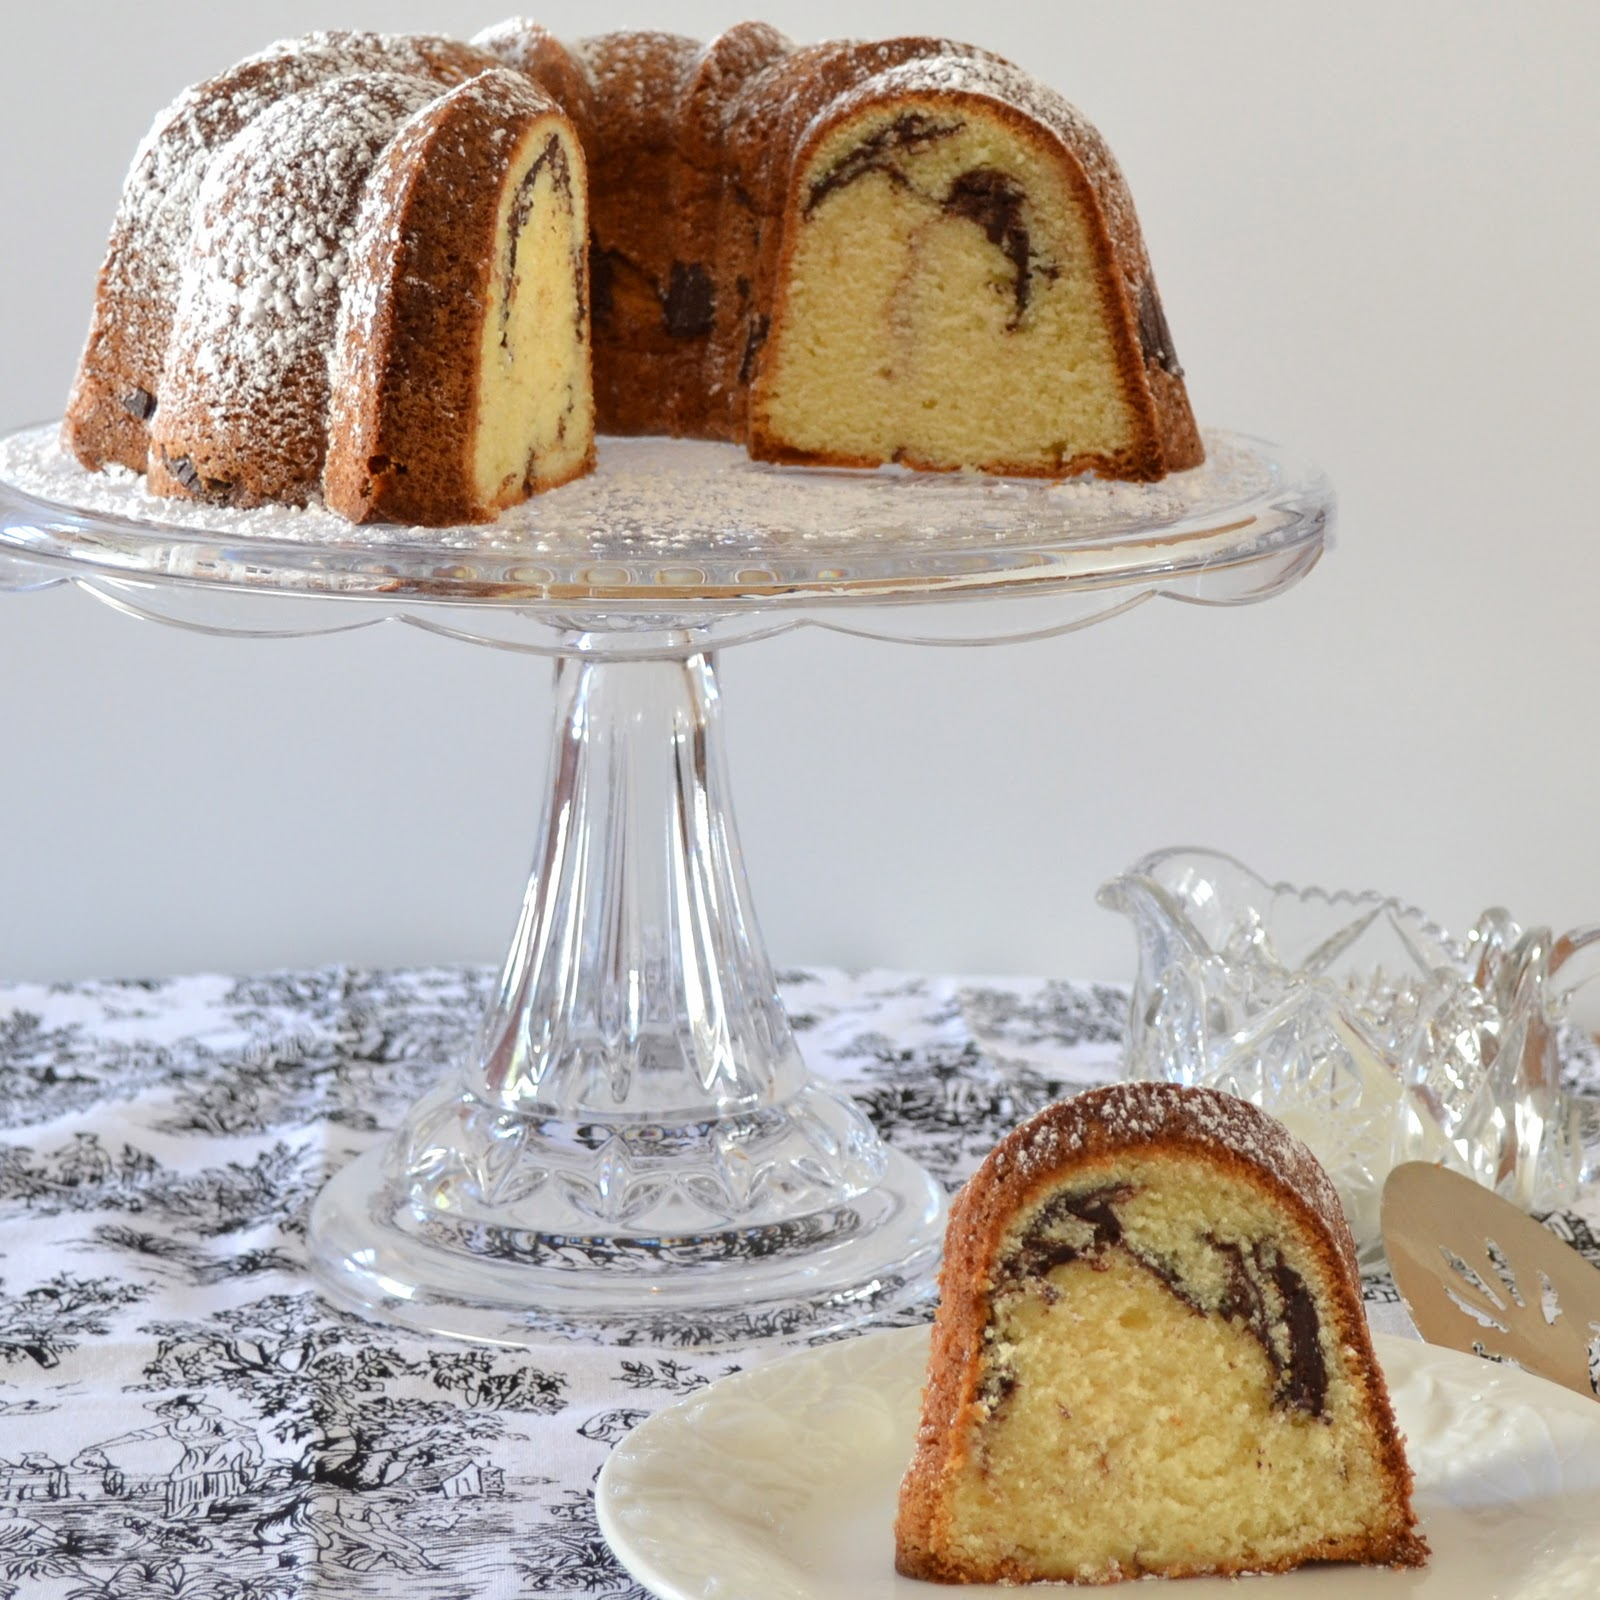 Philly fluff cake recipe | Food fox recipes